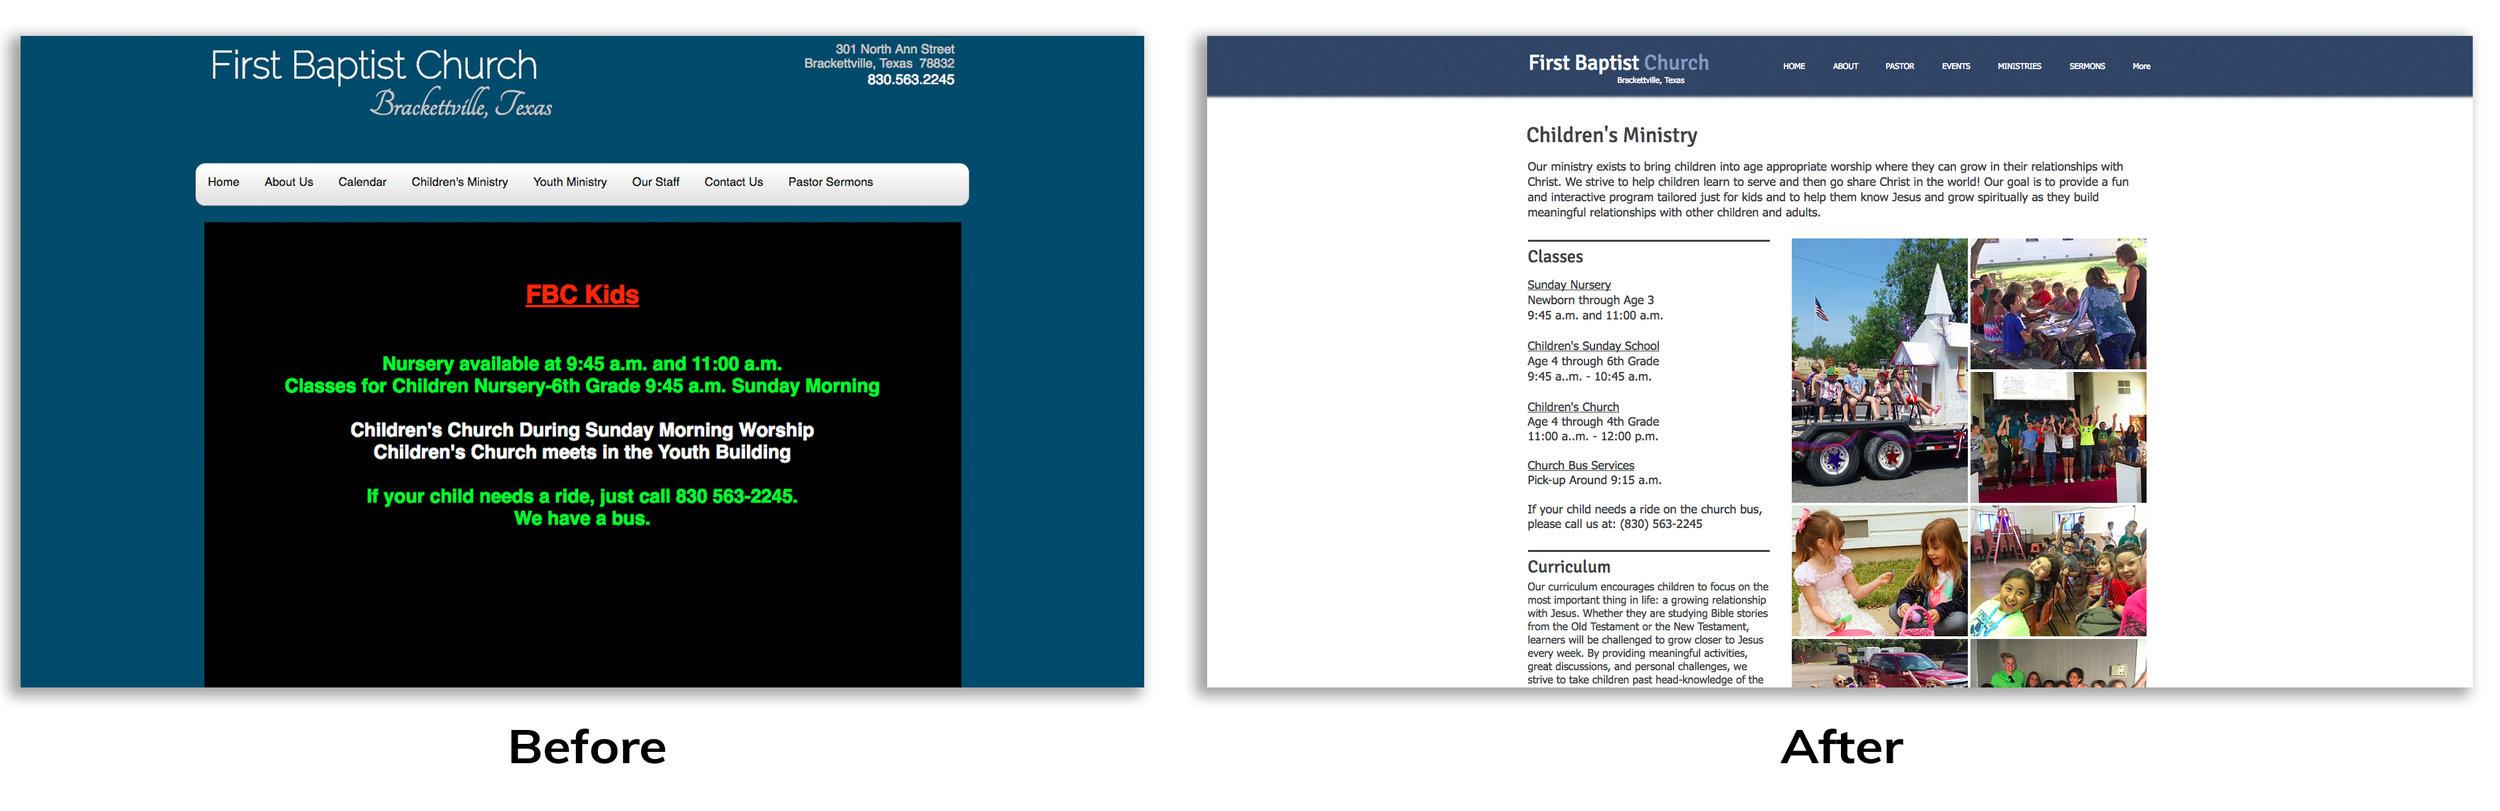 KidMinistry_Comparison.jpg